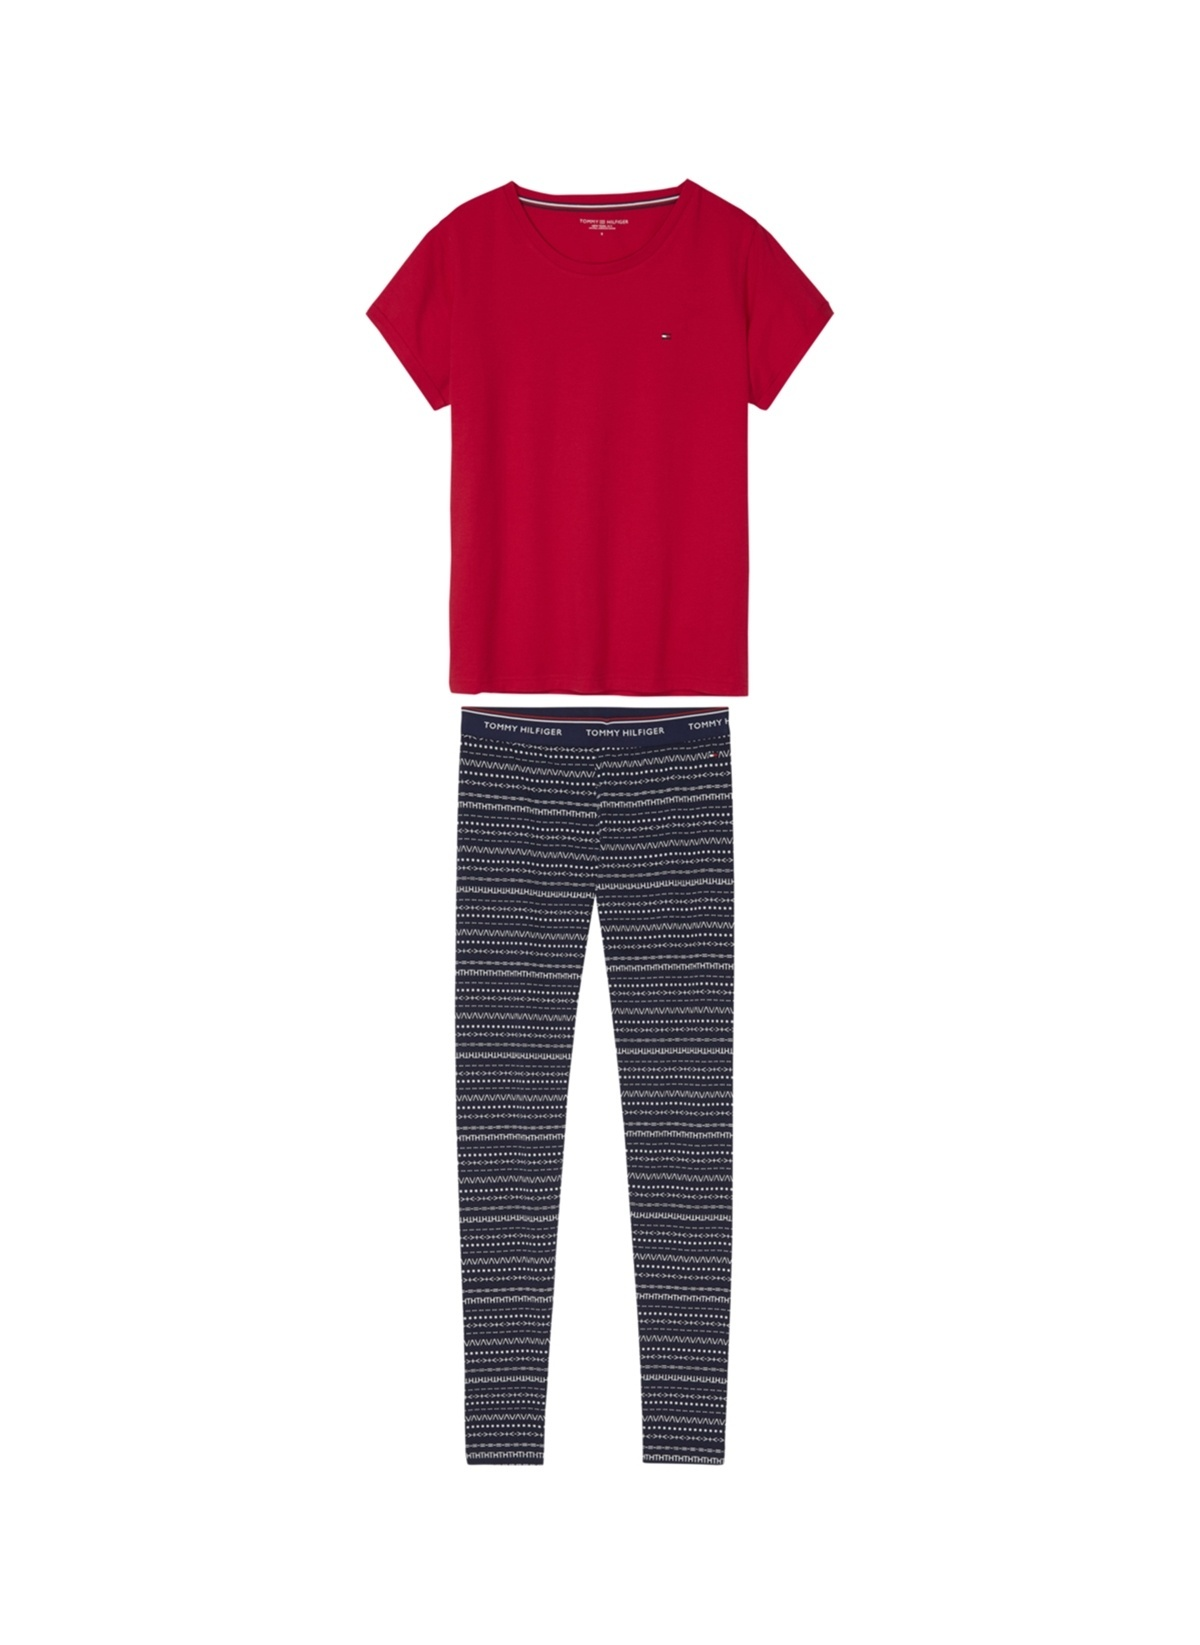 Tommy Hilfiger Pijama Takım Uw0uw01350 Tommy Hilfiger Pijama Tak – 349.0 TL